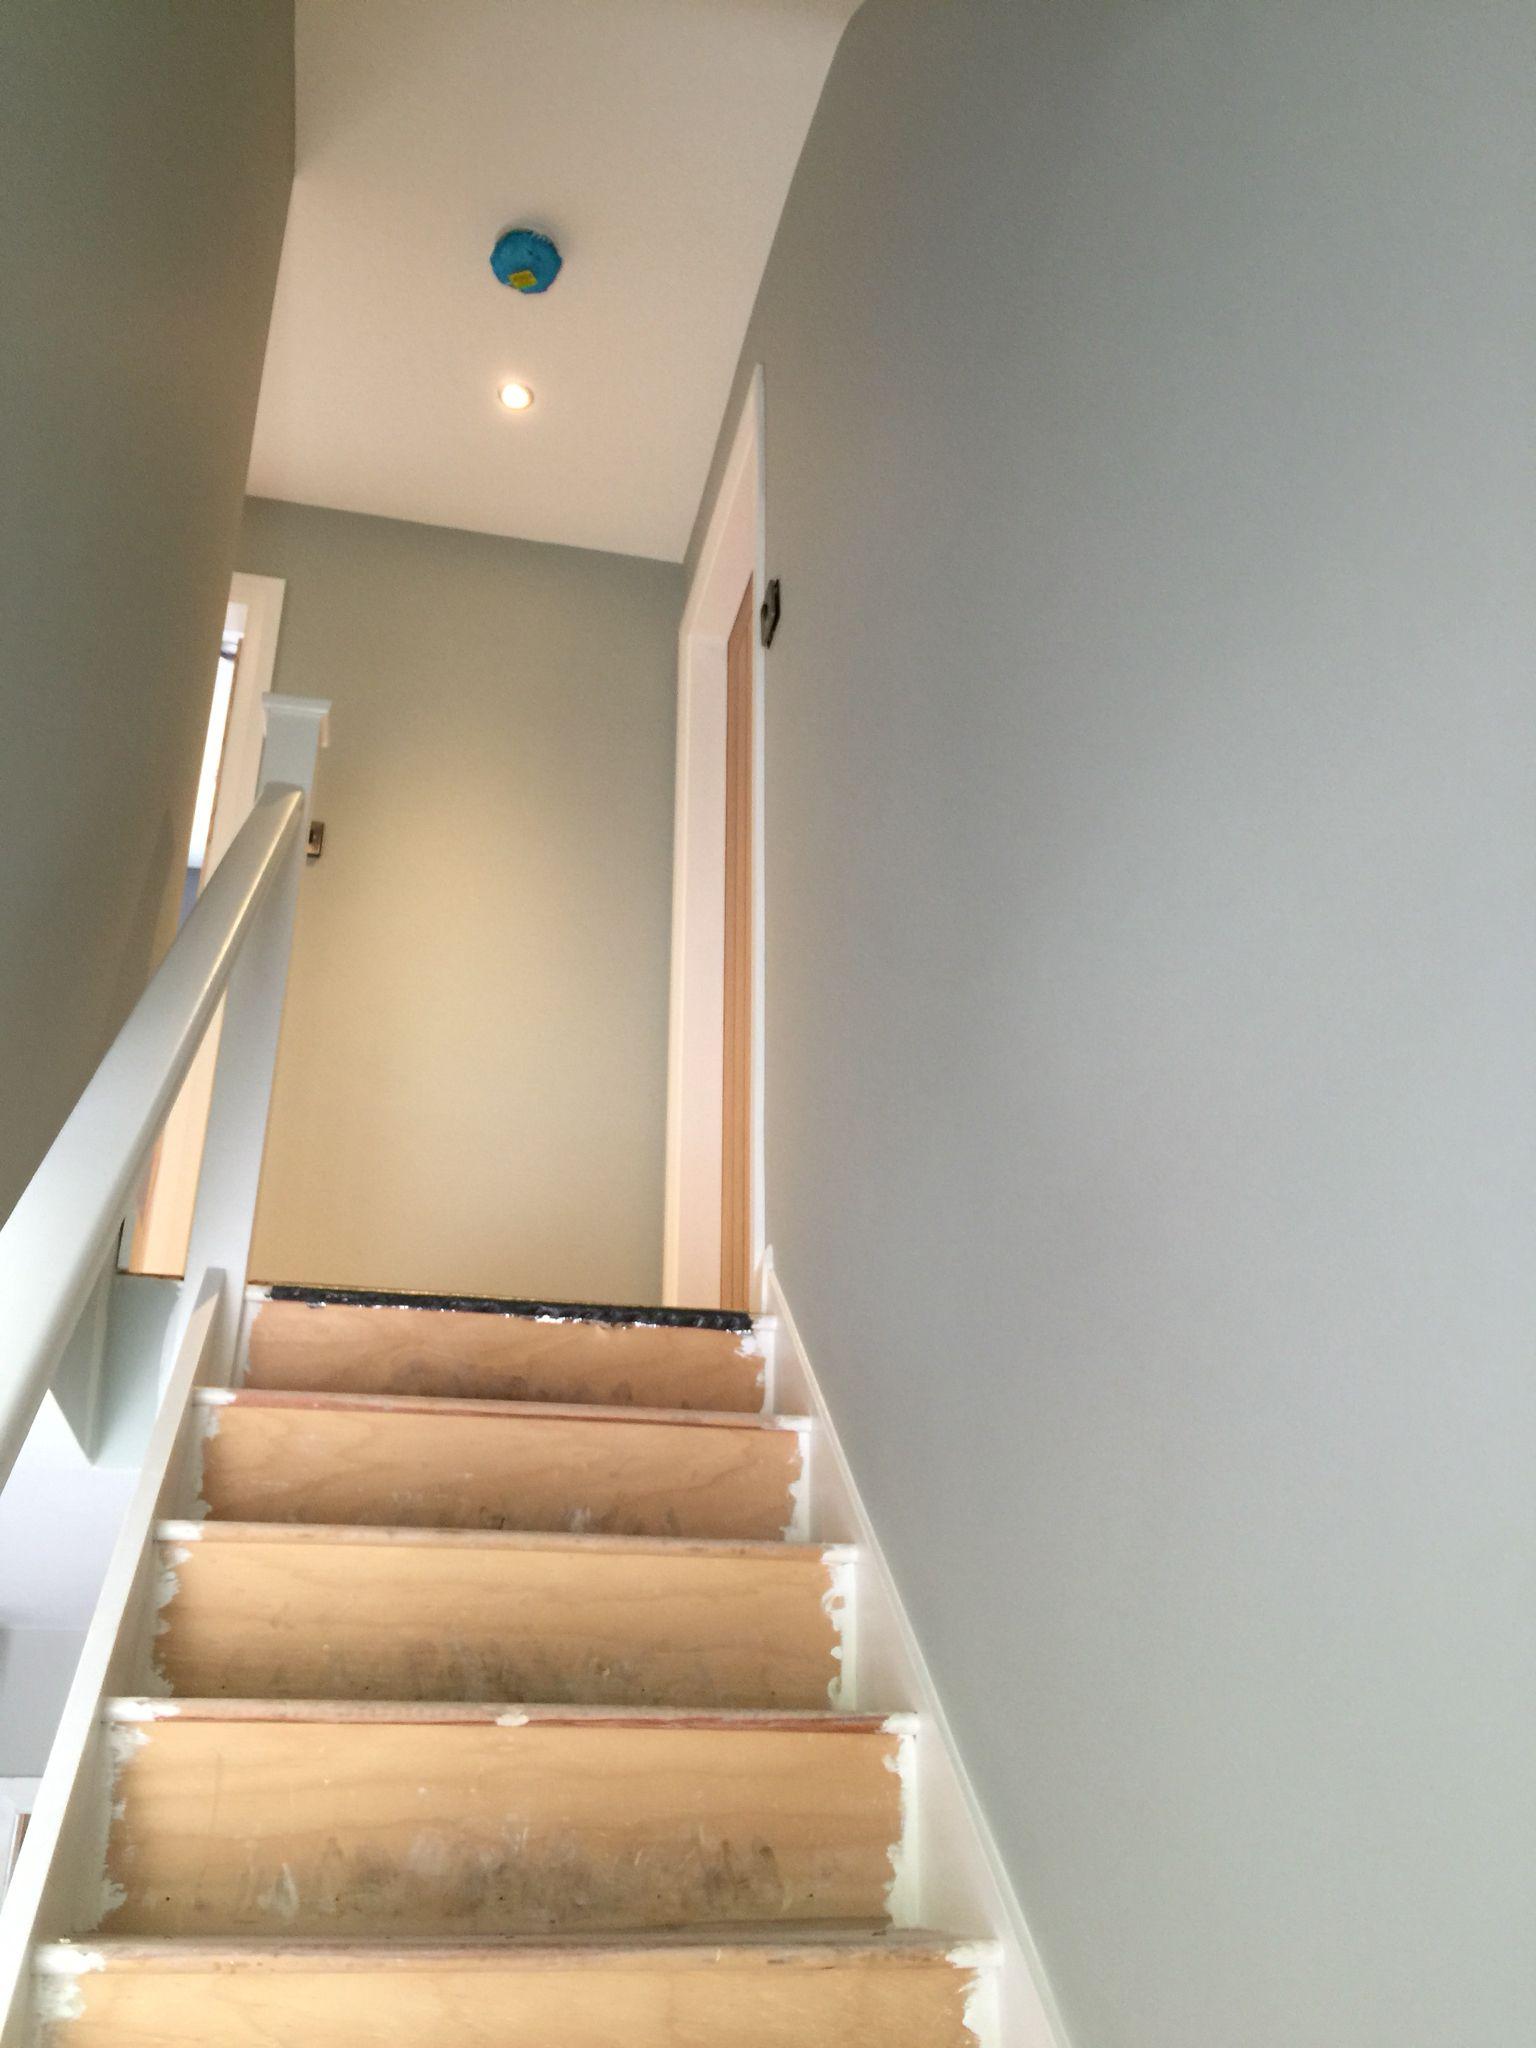 Farrow & Ball, mizzle.  Gorgeous colour for the stairs